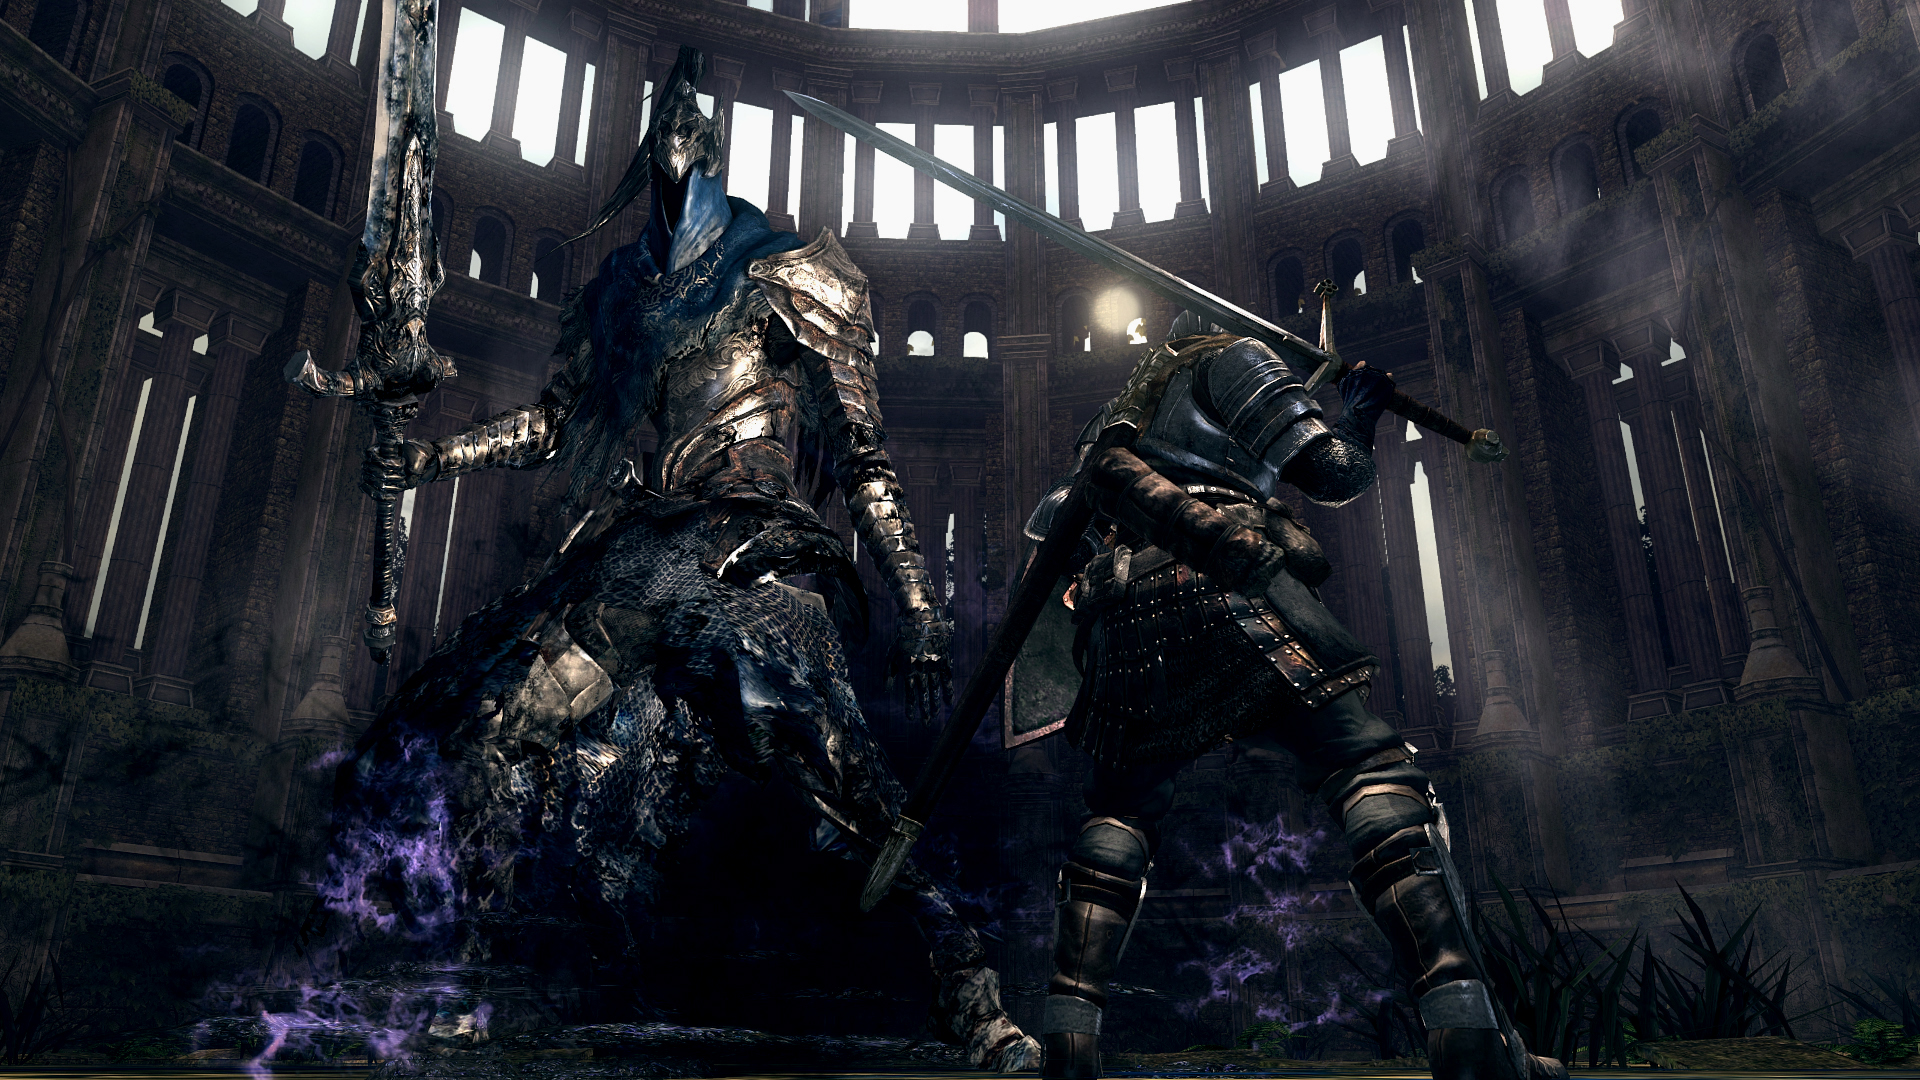 Dragon Slayer Knight Artorias And His Pet Wolf Sif Vs